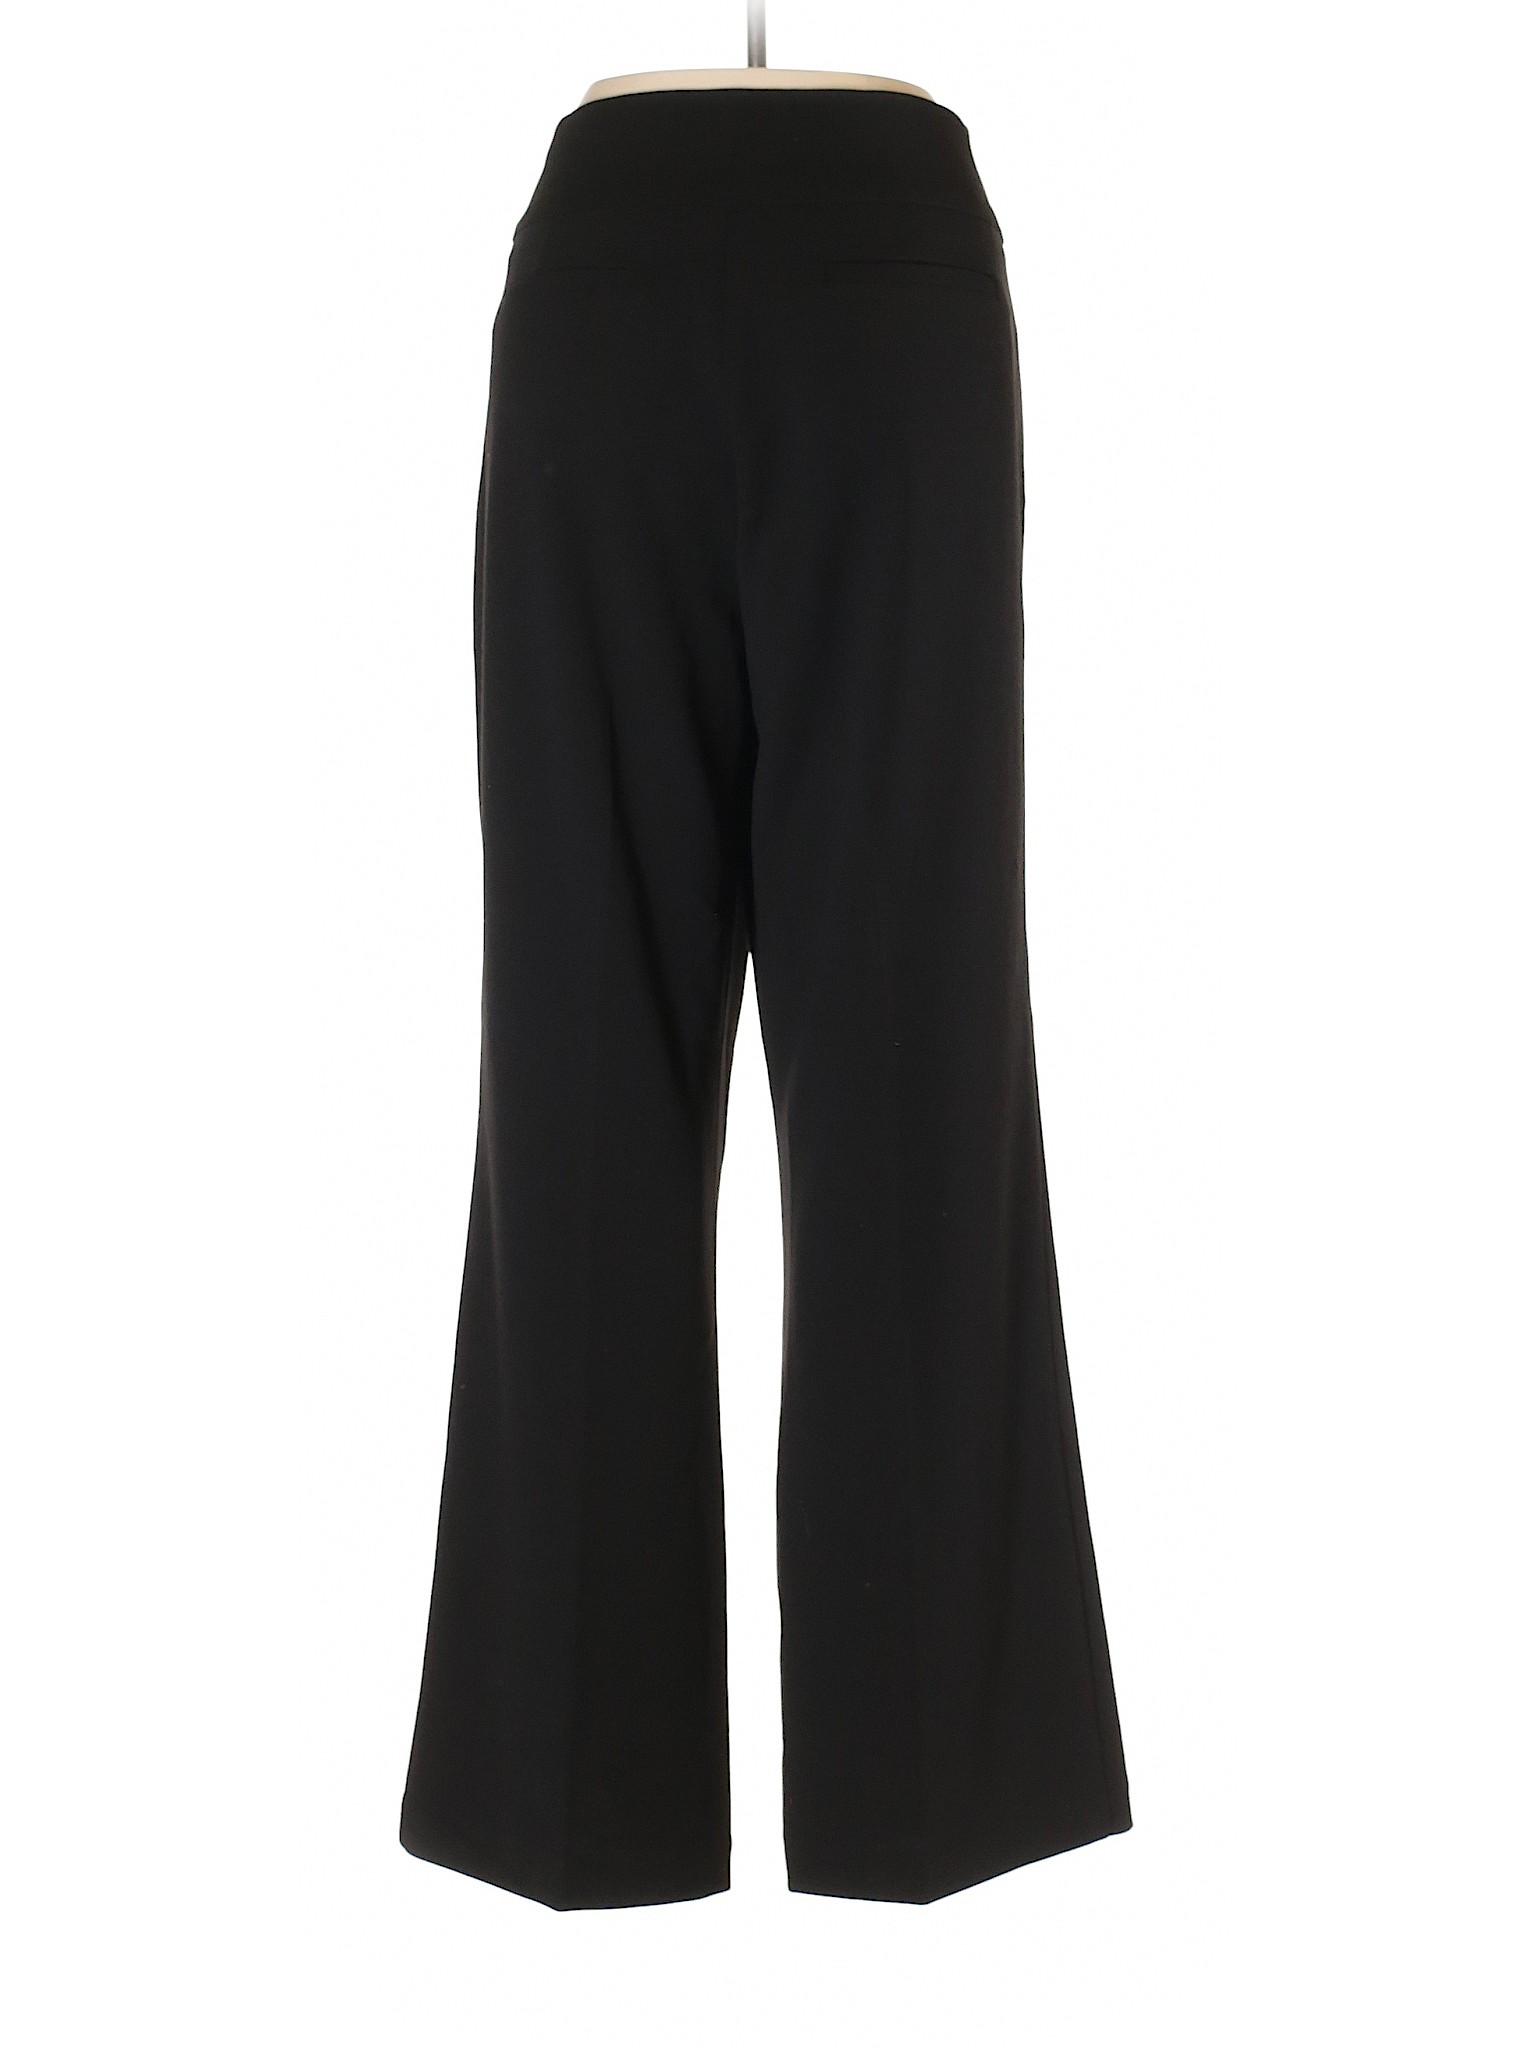 Boutique Dana Buchman Pants Dress winter rF6qwr